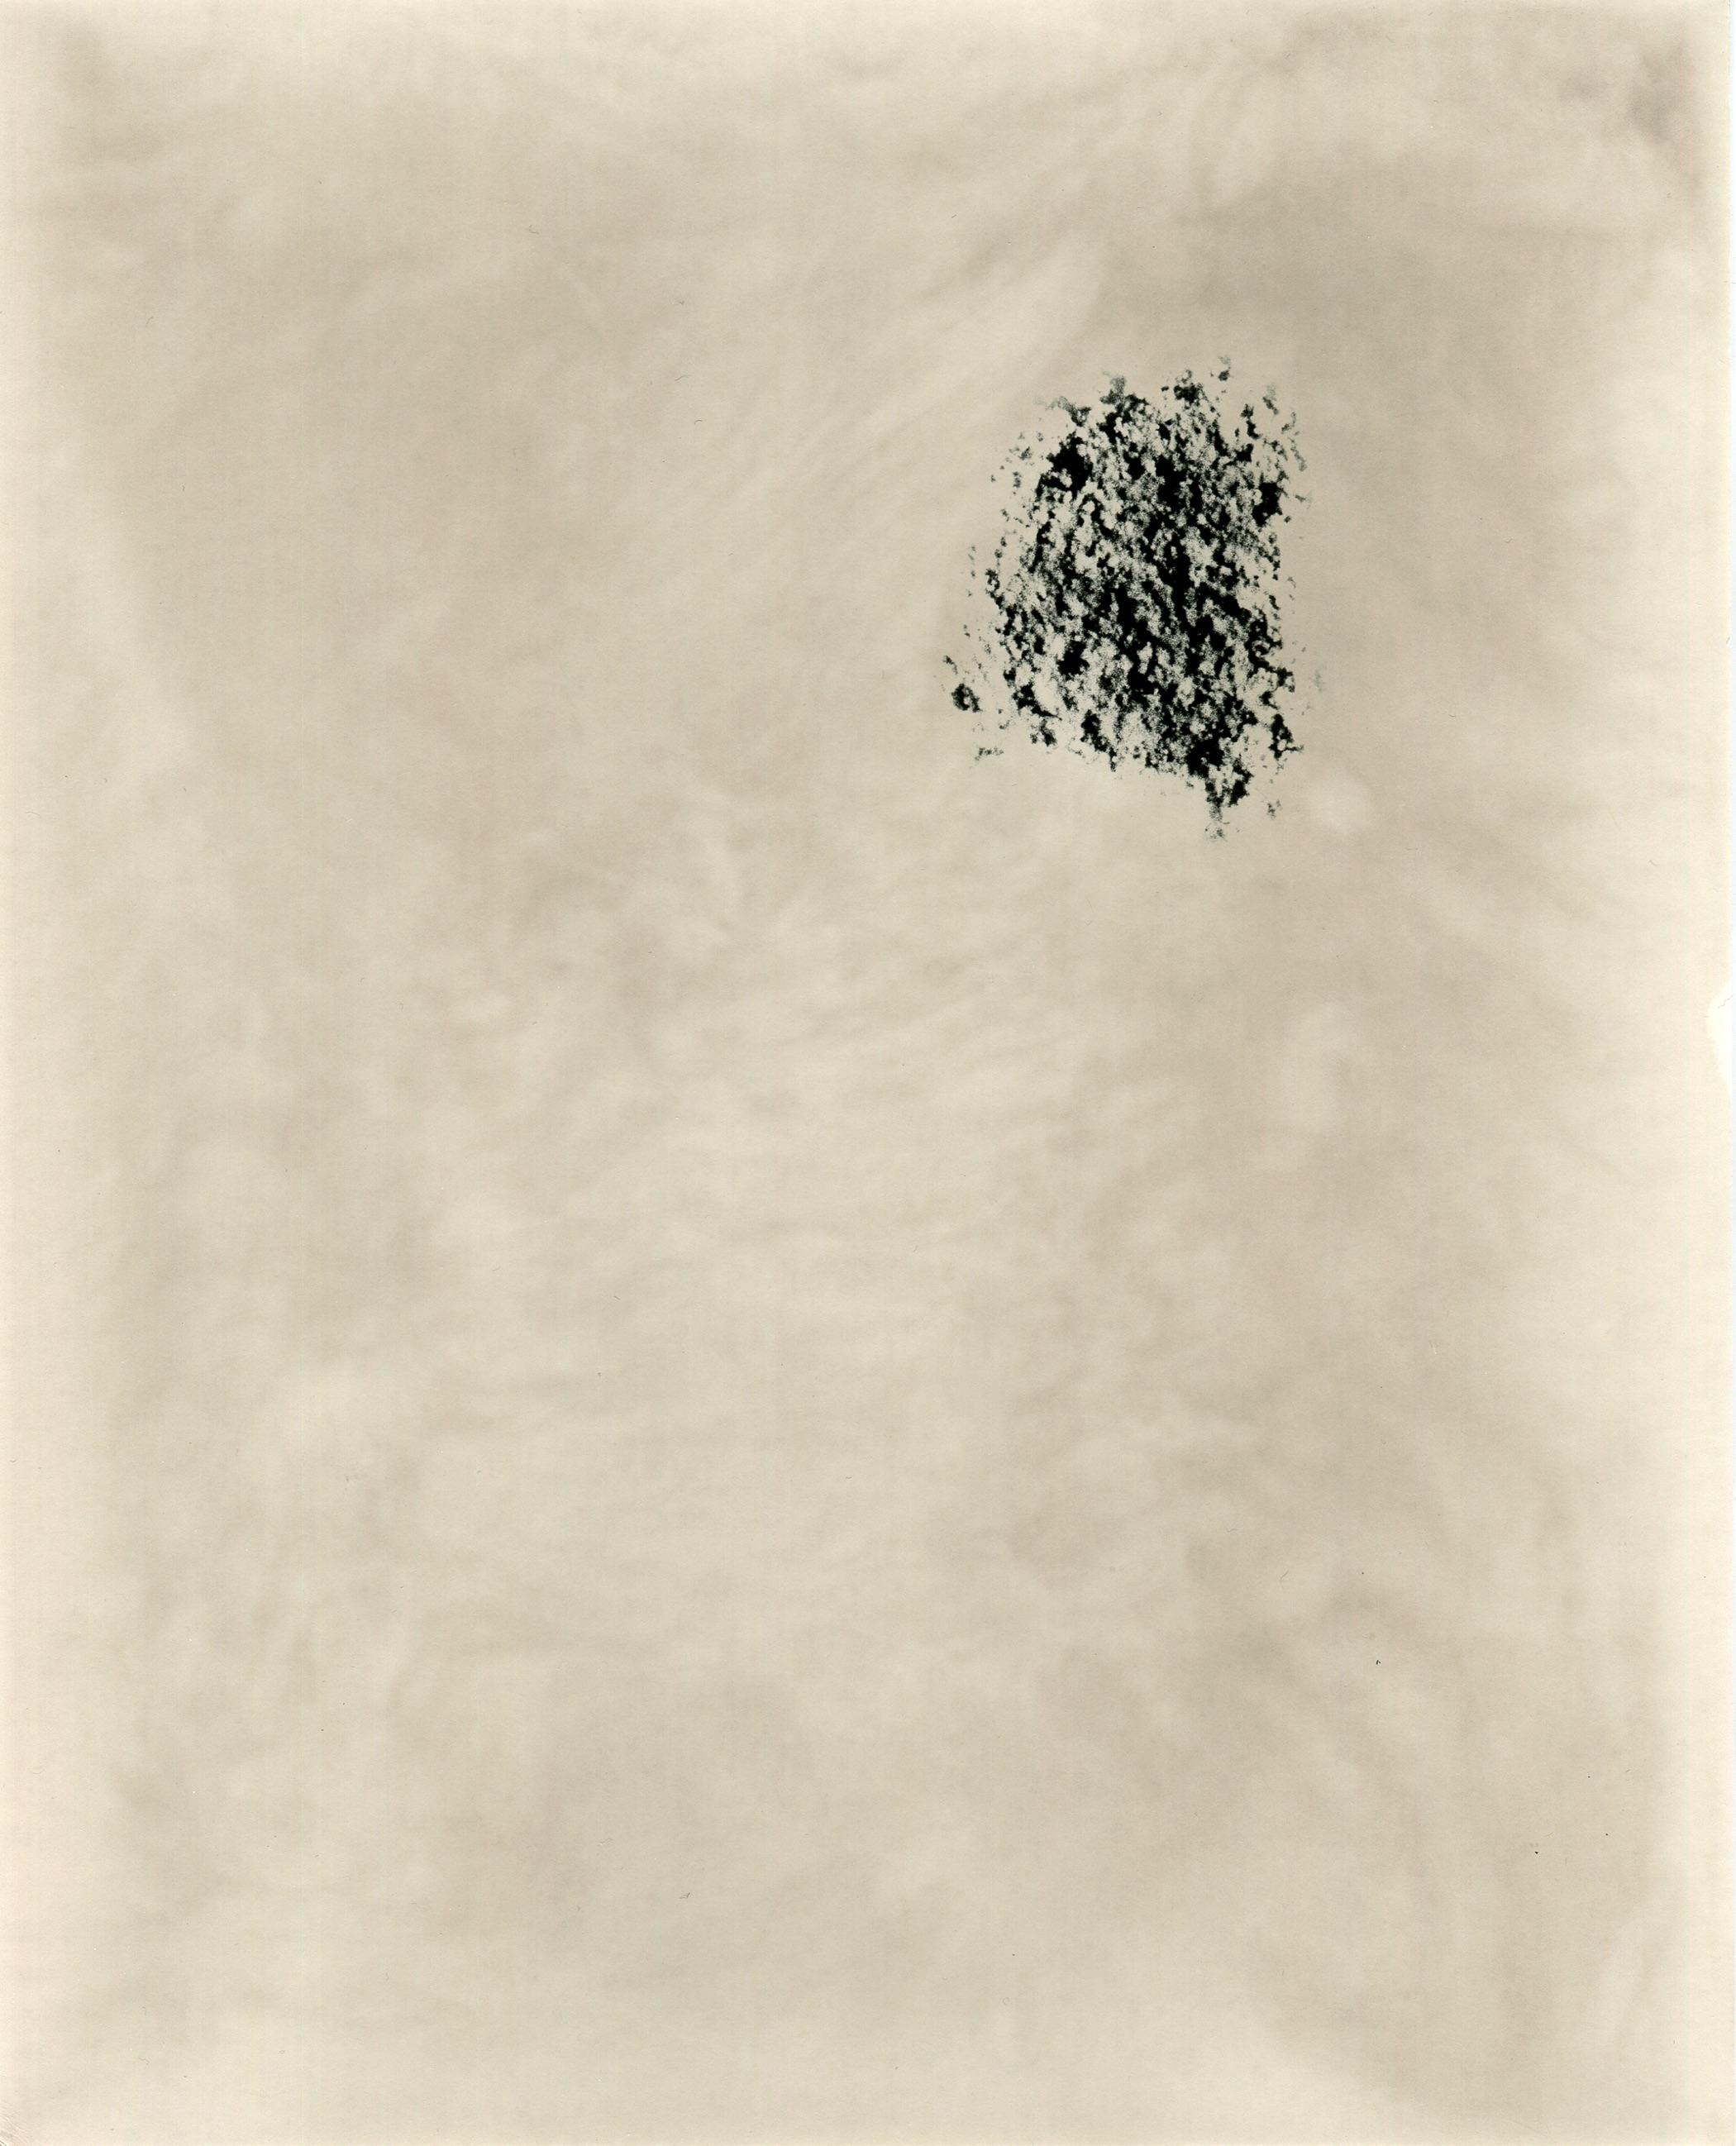 Vittoria Gerardi, Confine_Courtesy Galerie Thierry Bigaignon